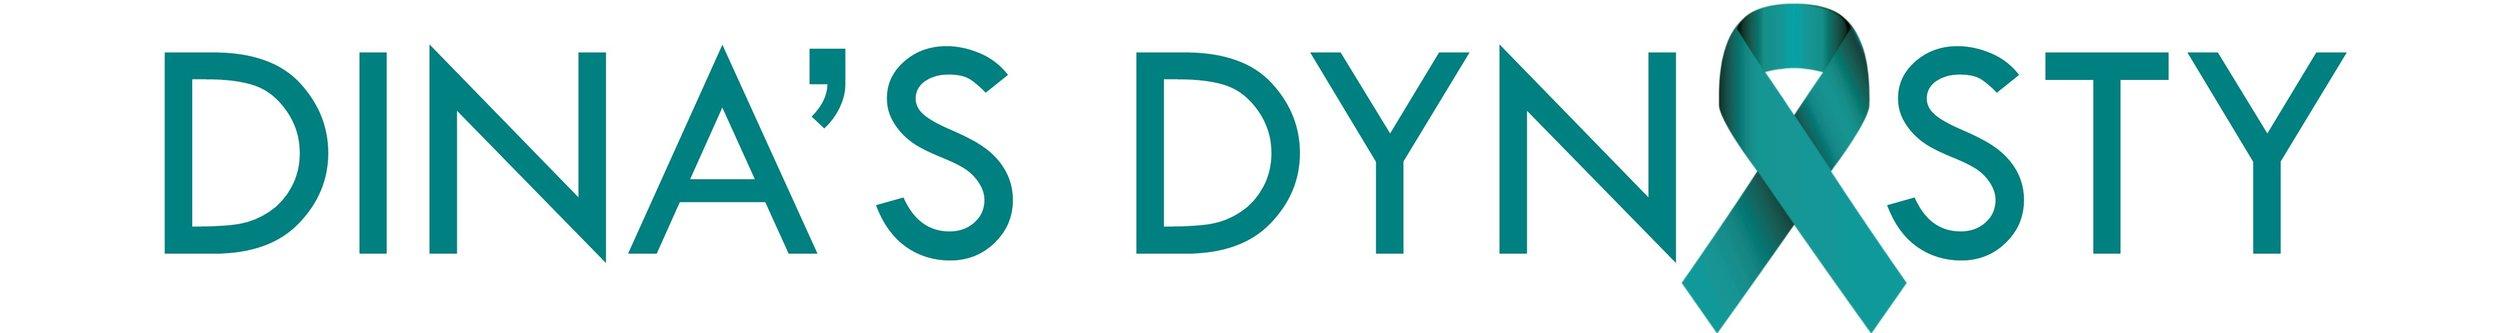 Dinas Dynasty Logo white background - teal ribbon.jpg